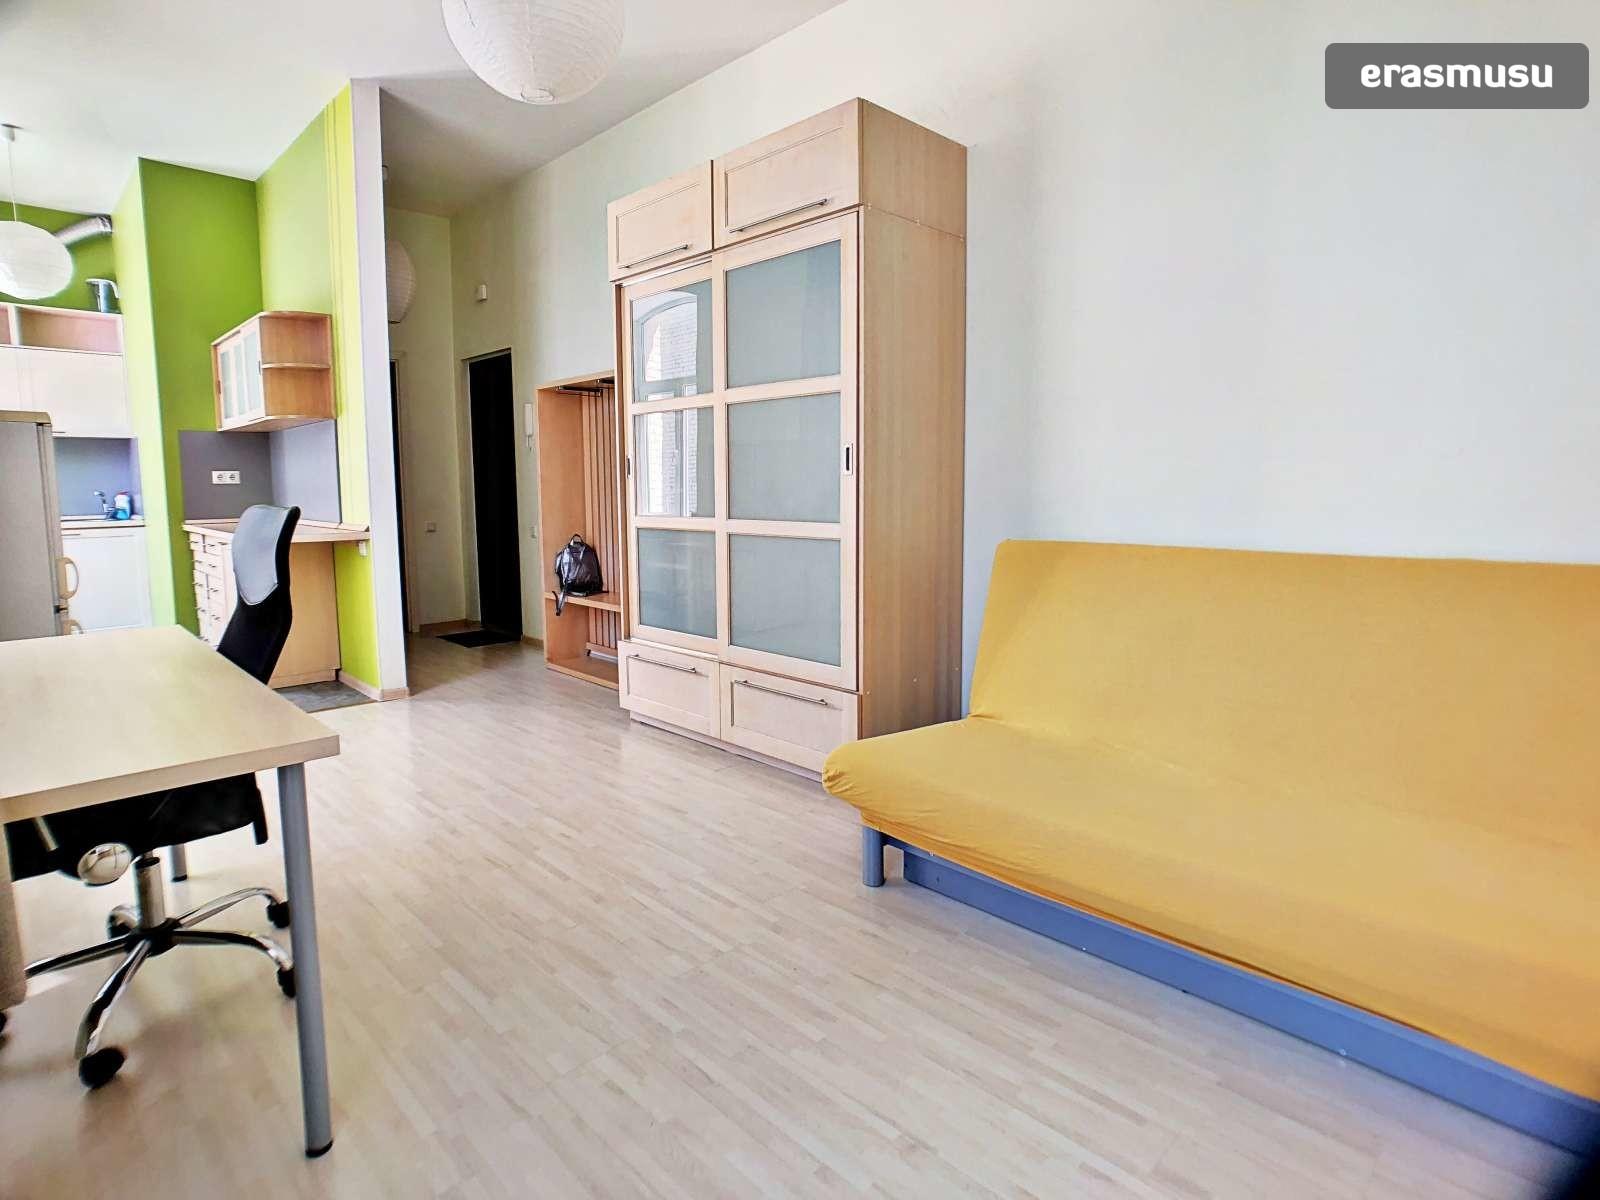 cheery-cute-studio-apartment-rent-dzirciems-74a1e5e9ba09b9f84dfe